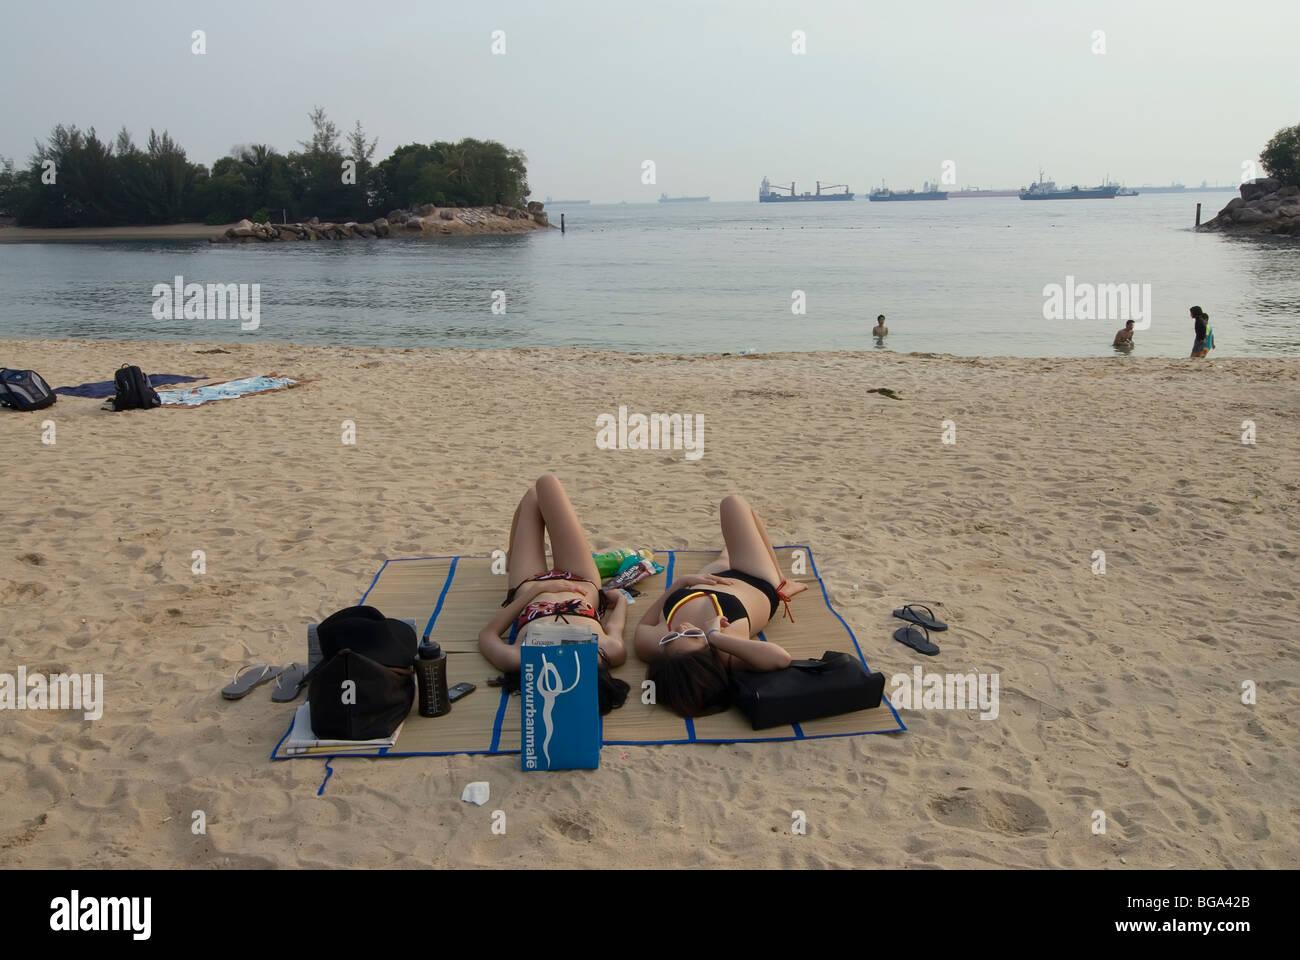 Sentosa Island beach off Singapore with two girls sunbathing in bikinis - Stock Image